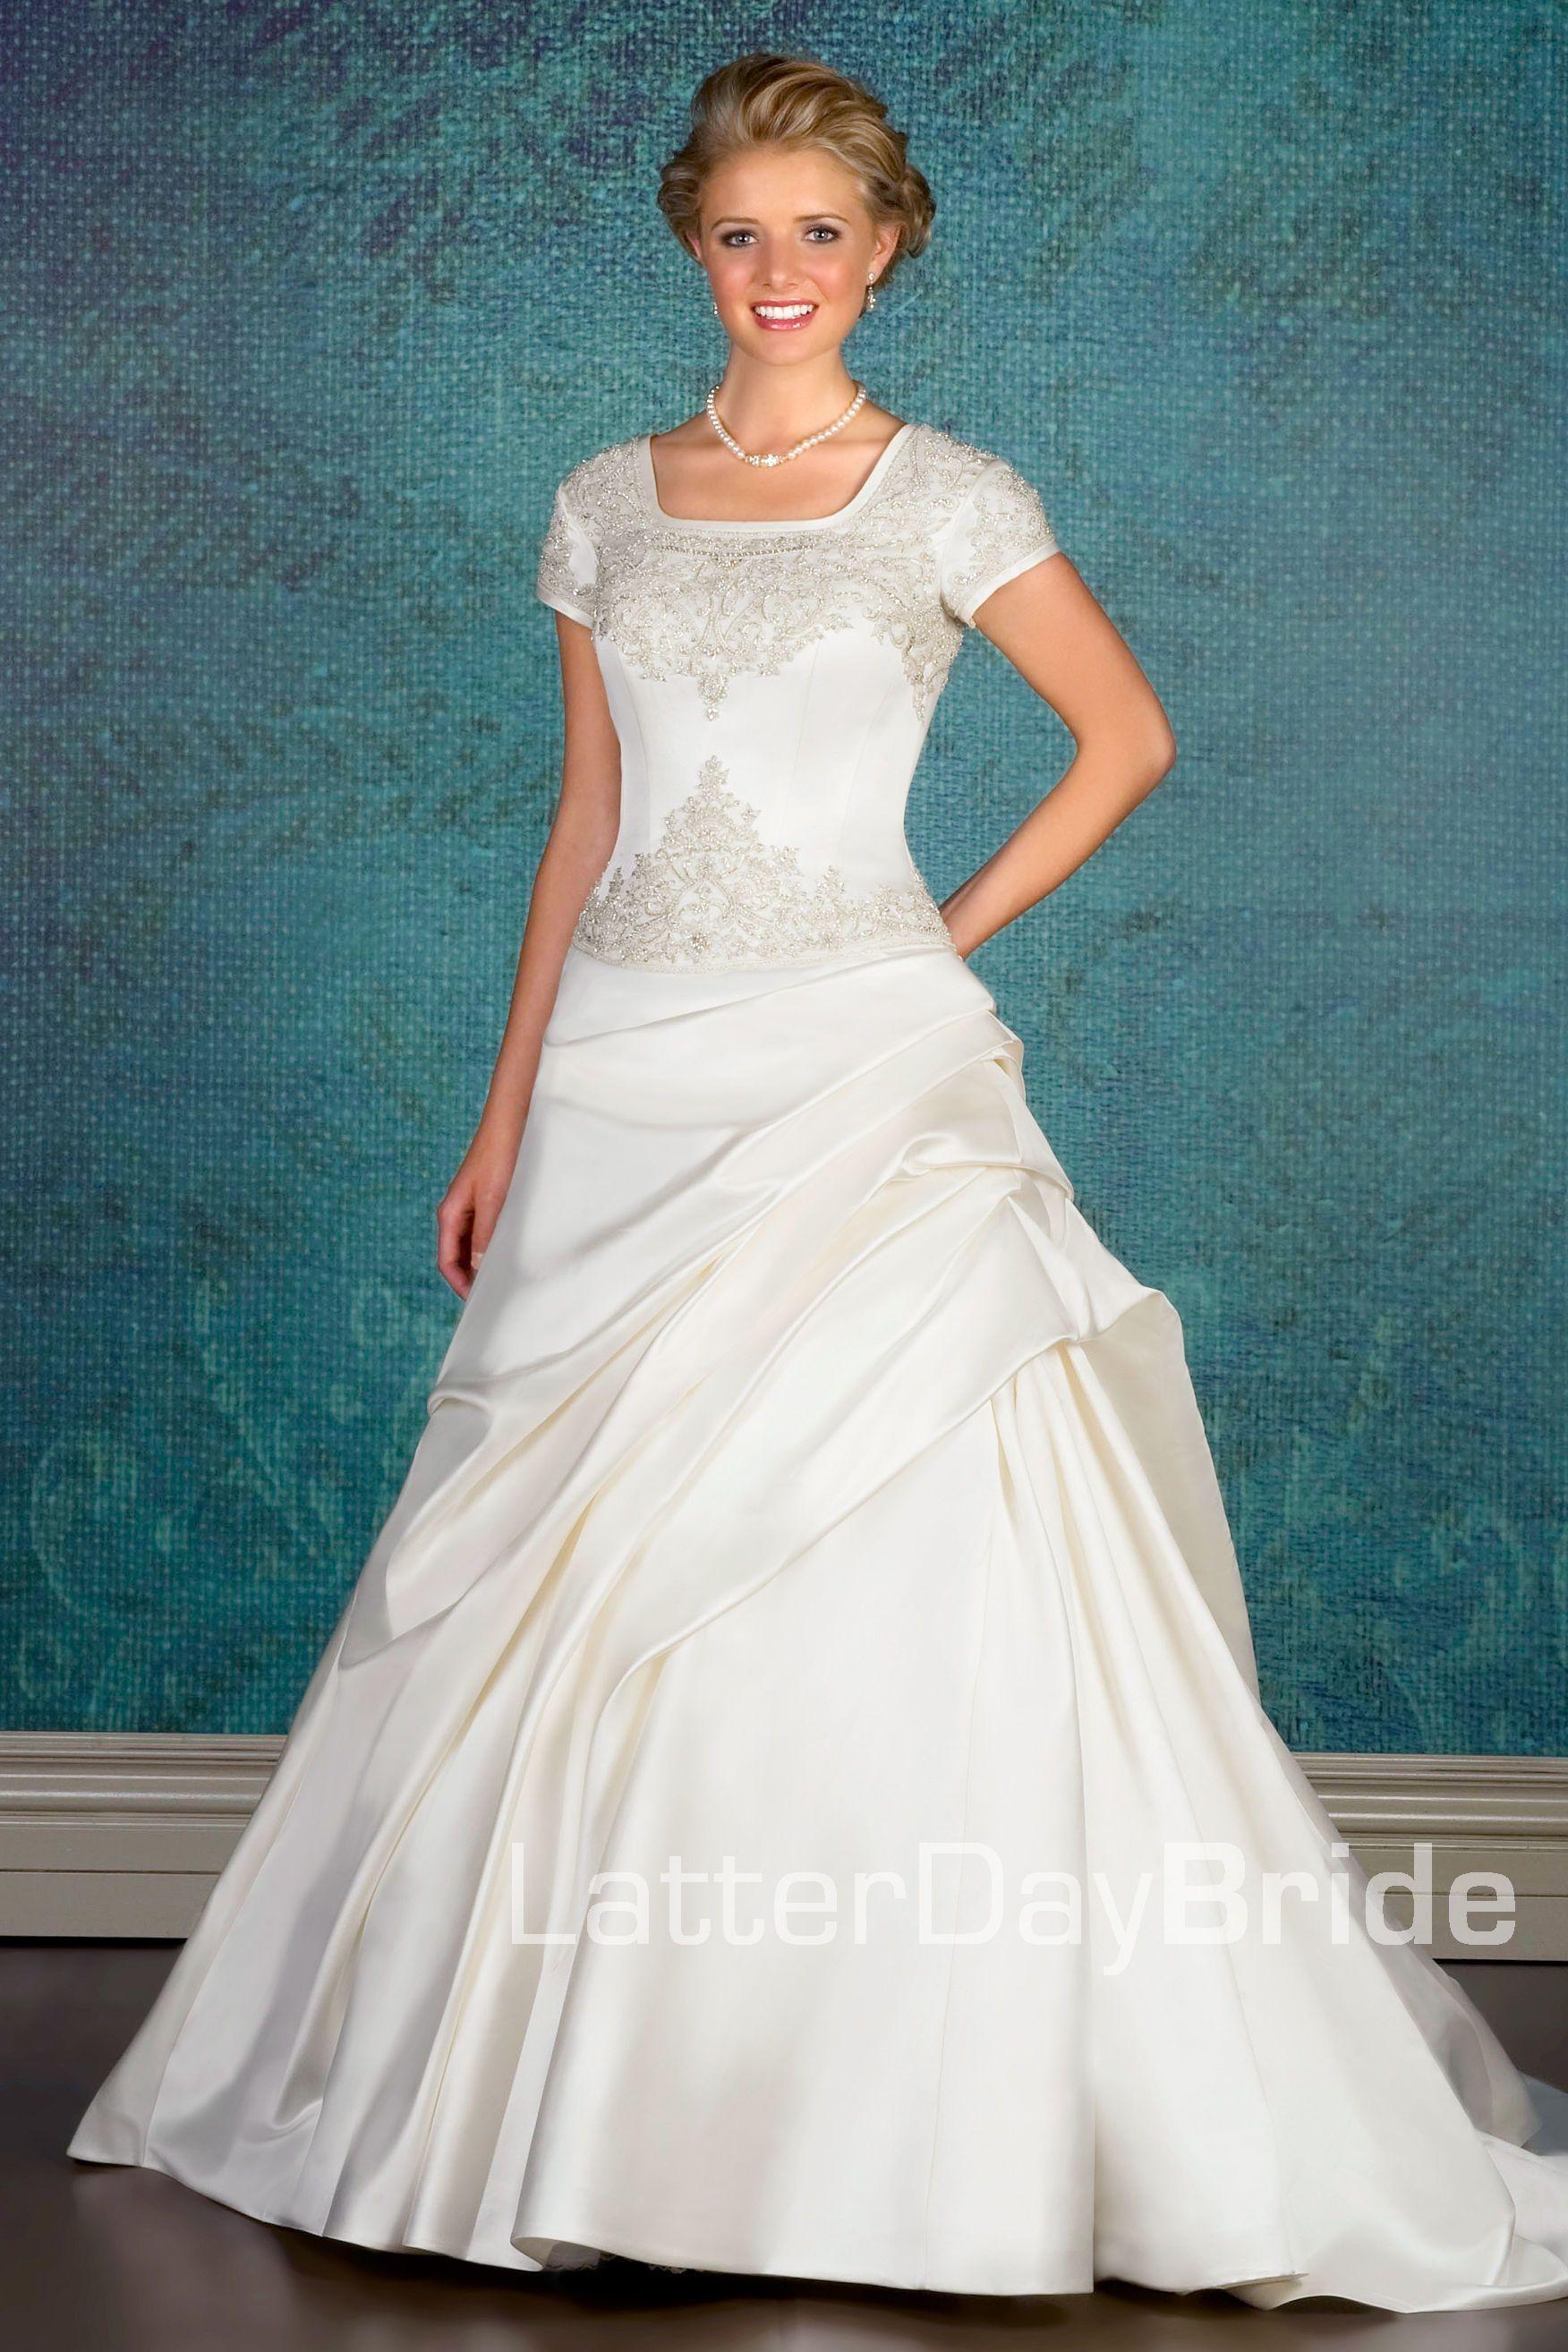 Modest Wedding Dress, Schouler LatterDayBride & Prom